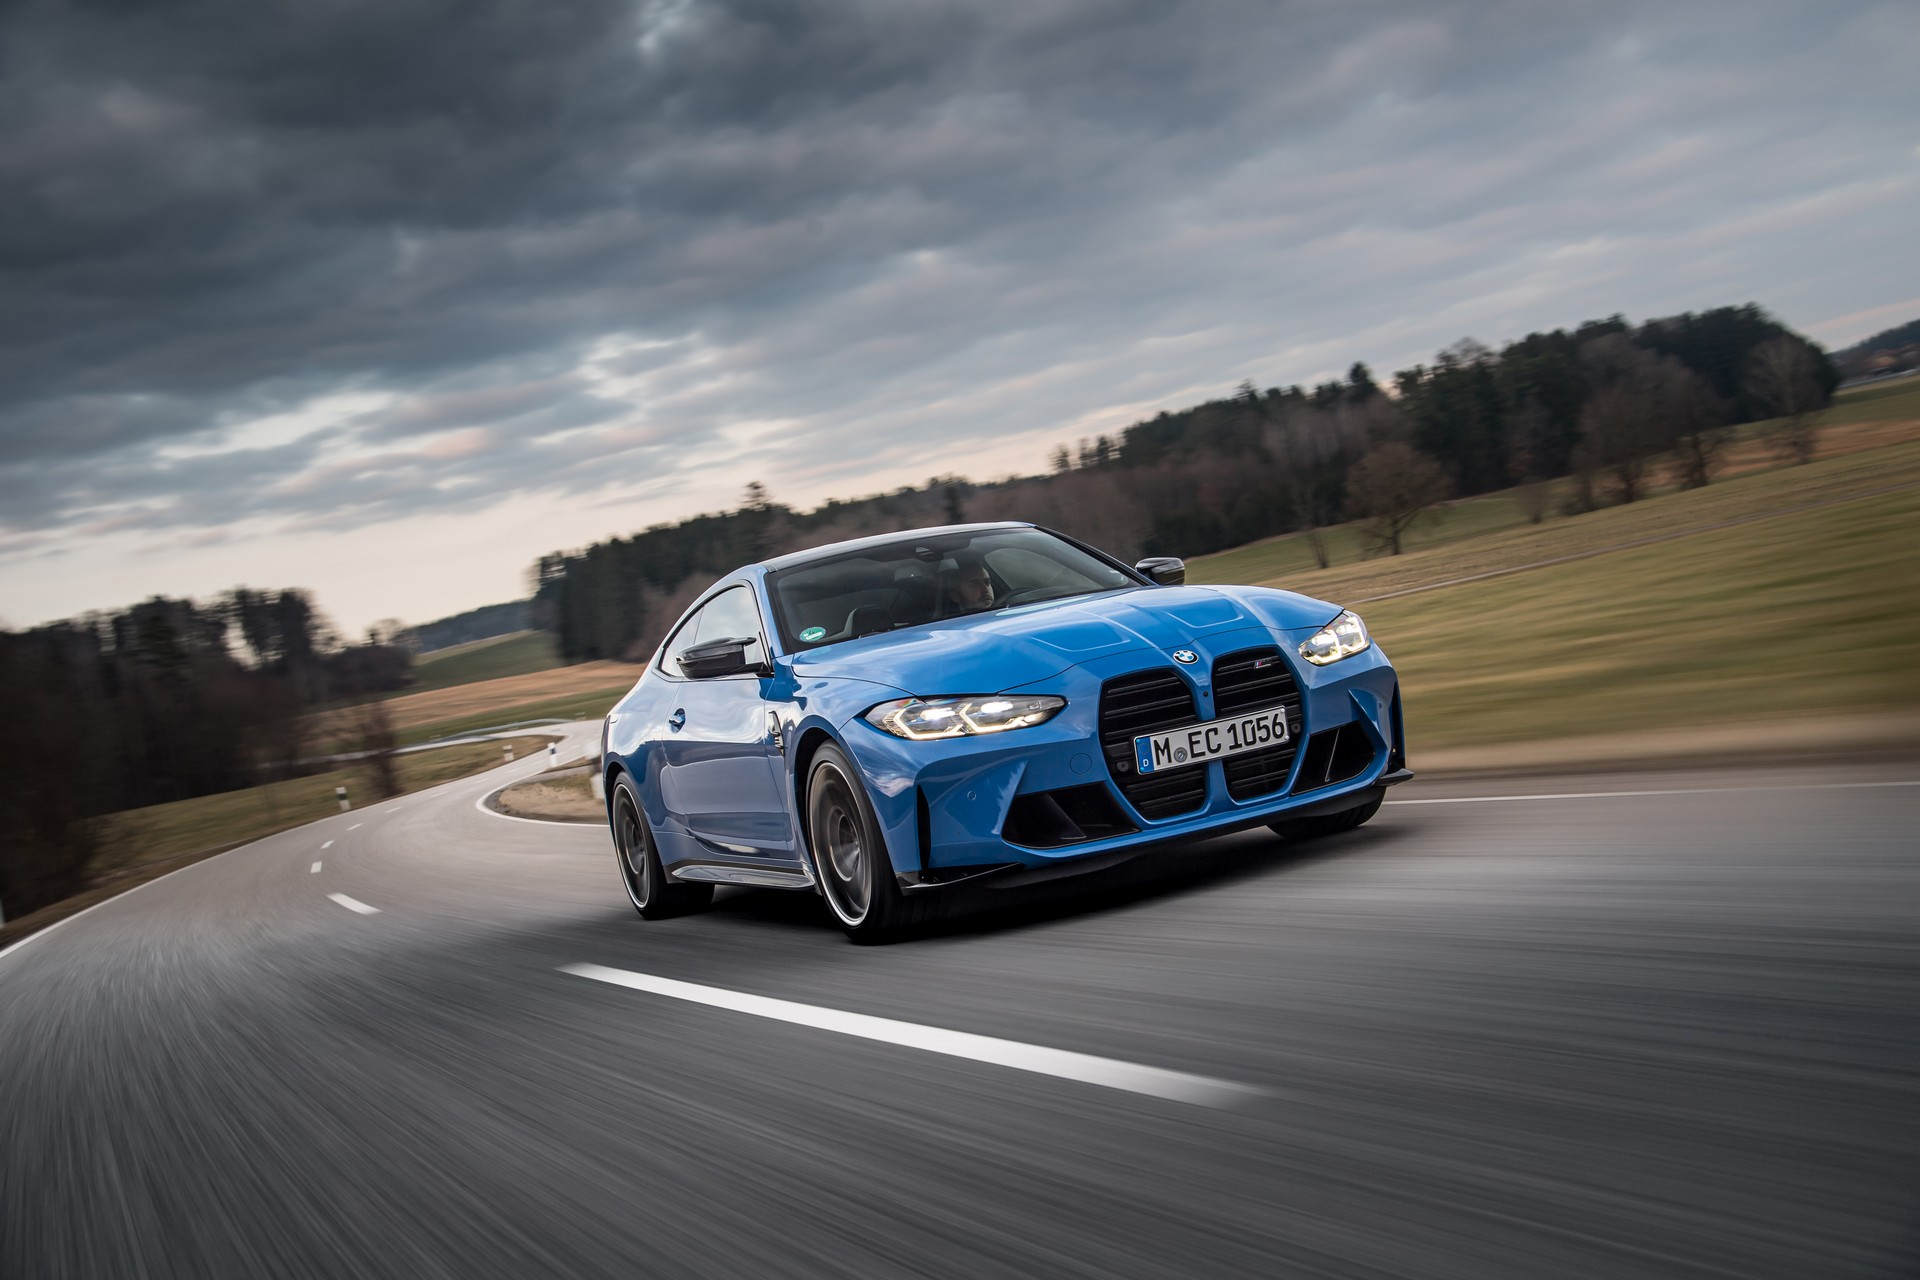 BMW-M3-M4-Competition-xDrive-15.jpg